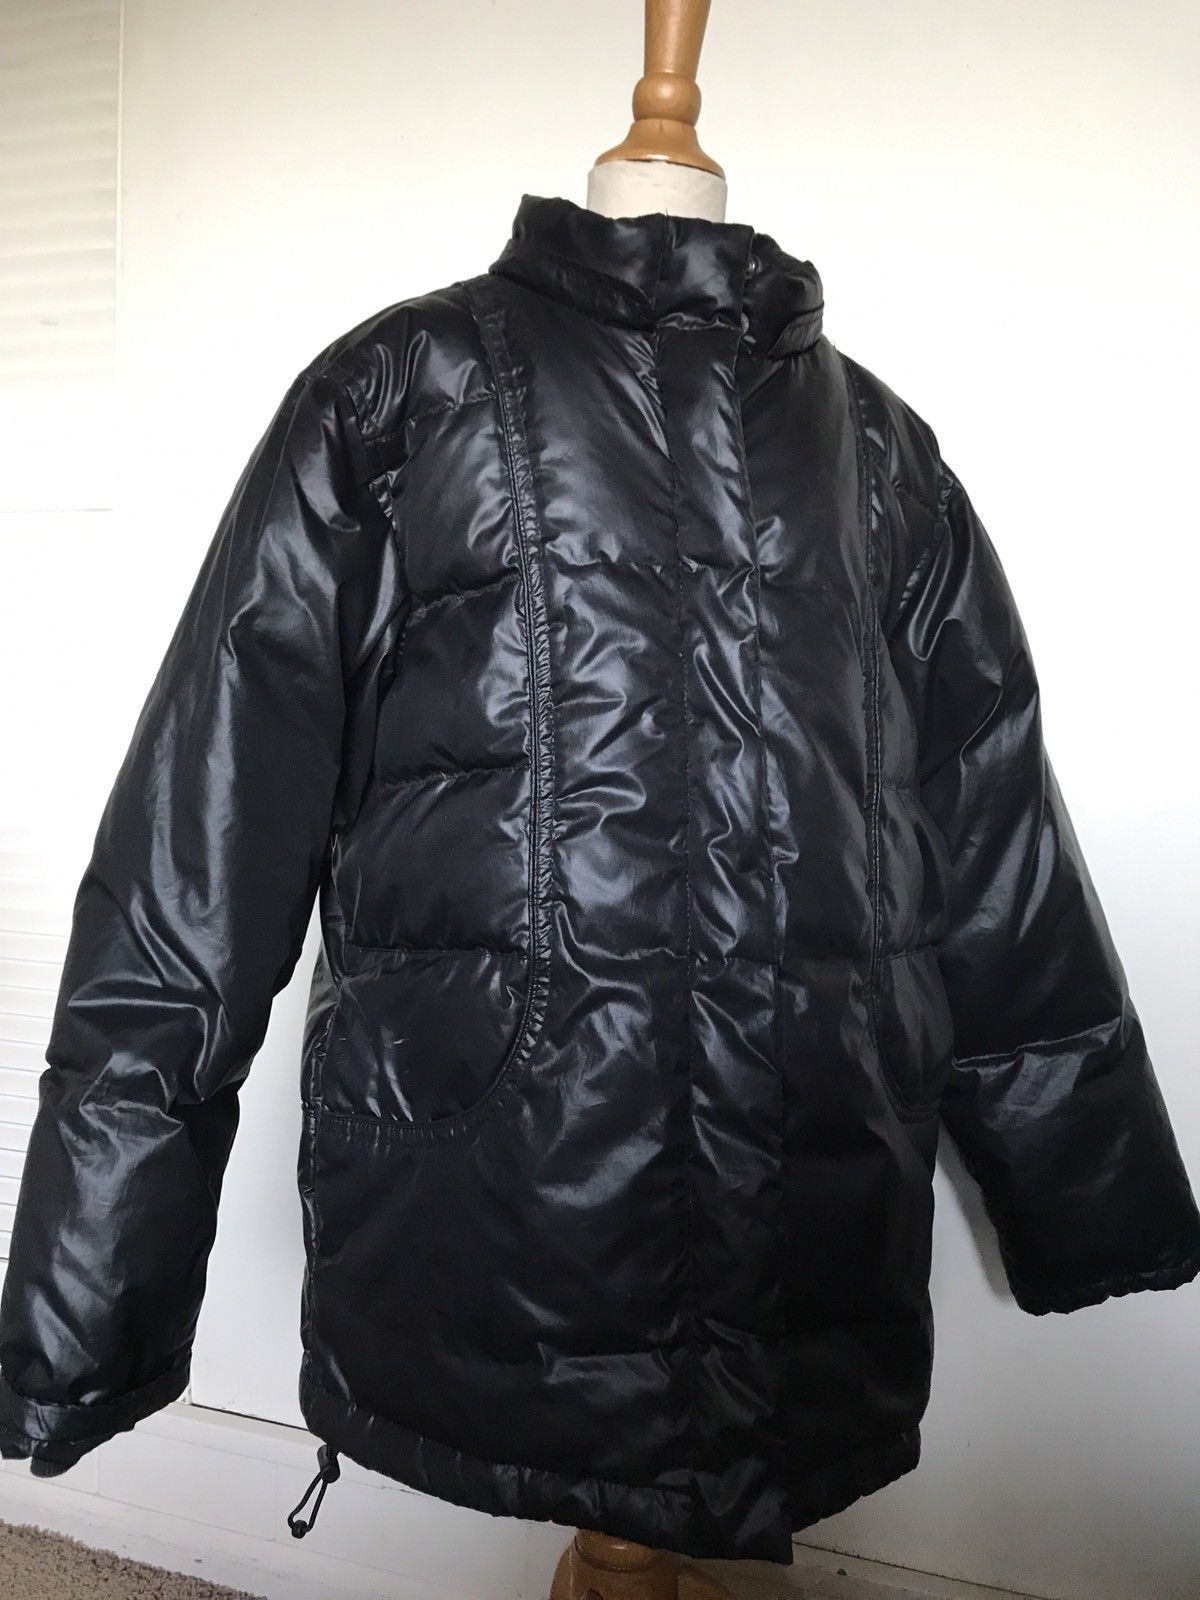 126340a4b38 Gap Kids Black Winter Warmest Puffer Down and similar items